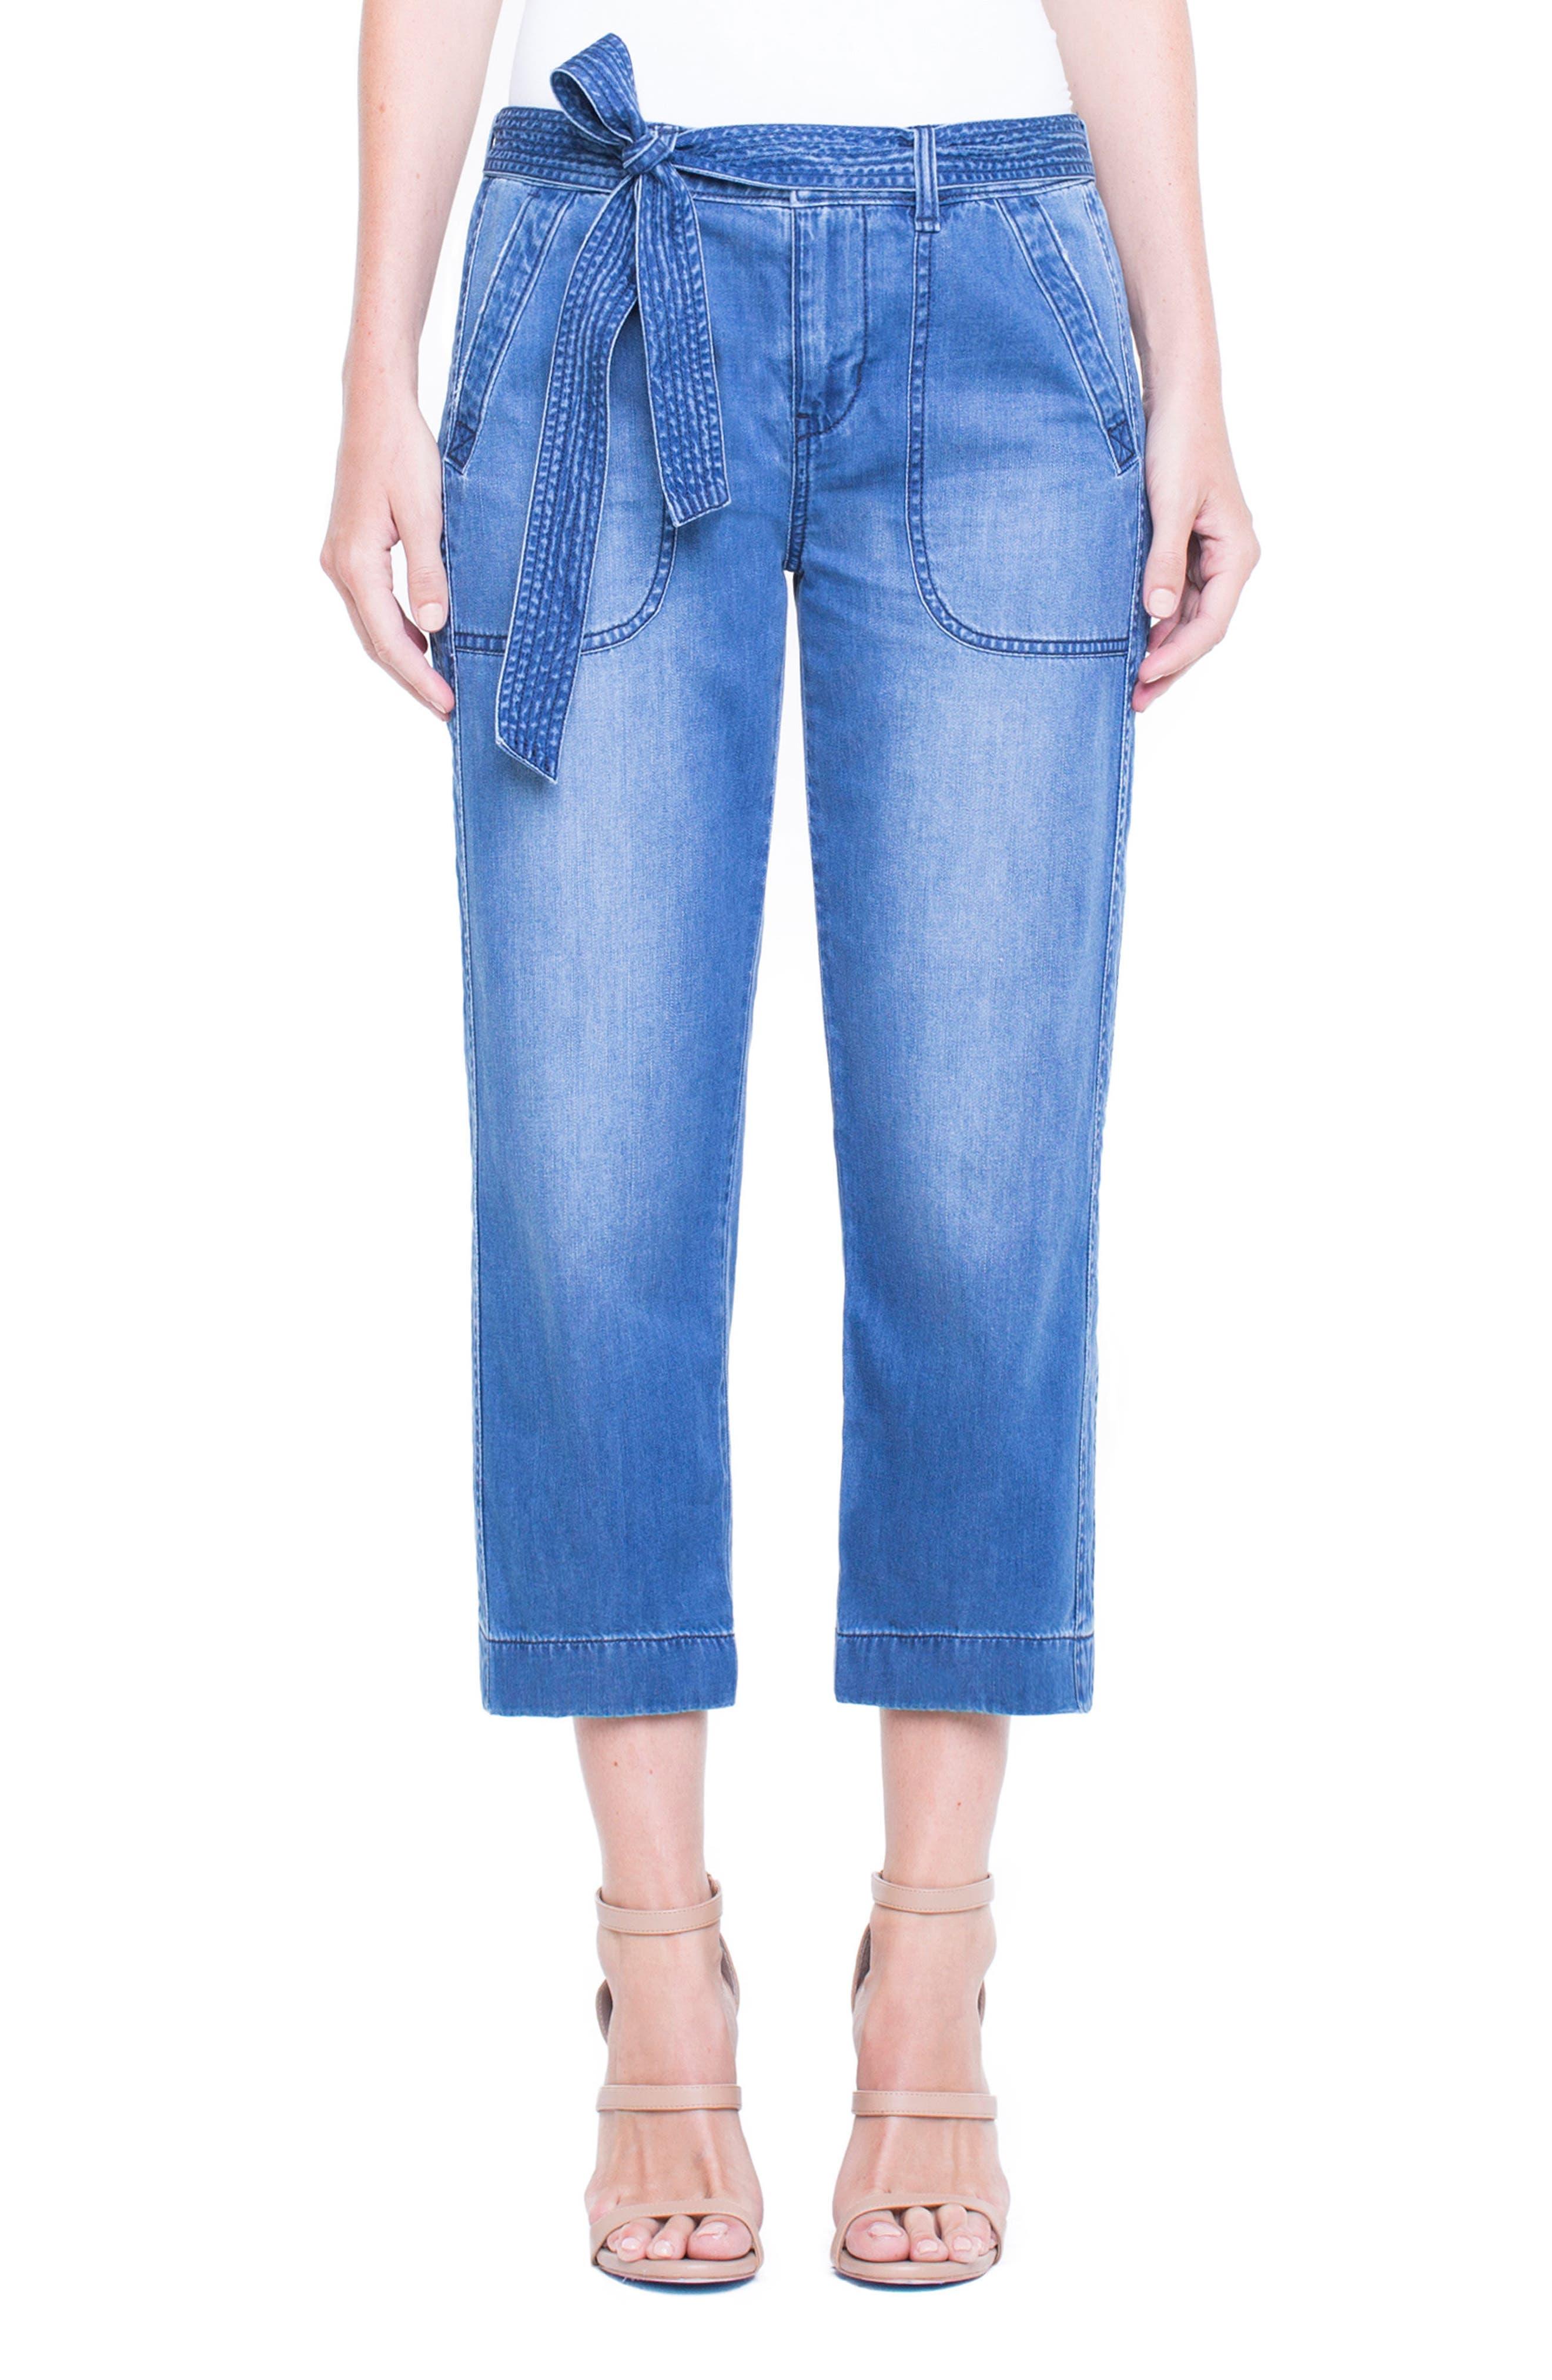 Main Image - Liverpool Jeans Company Norah Capri Jeans (Belfast Hand Sand)